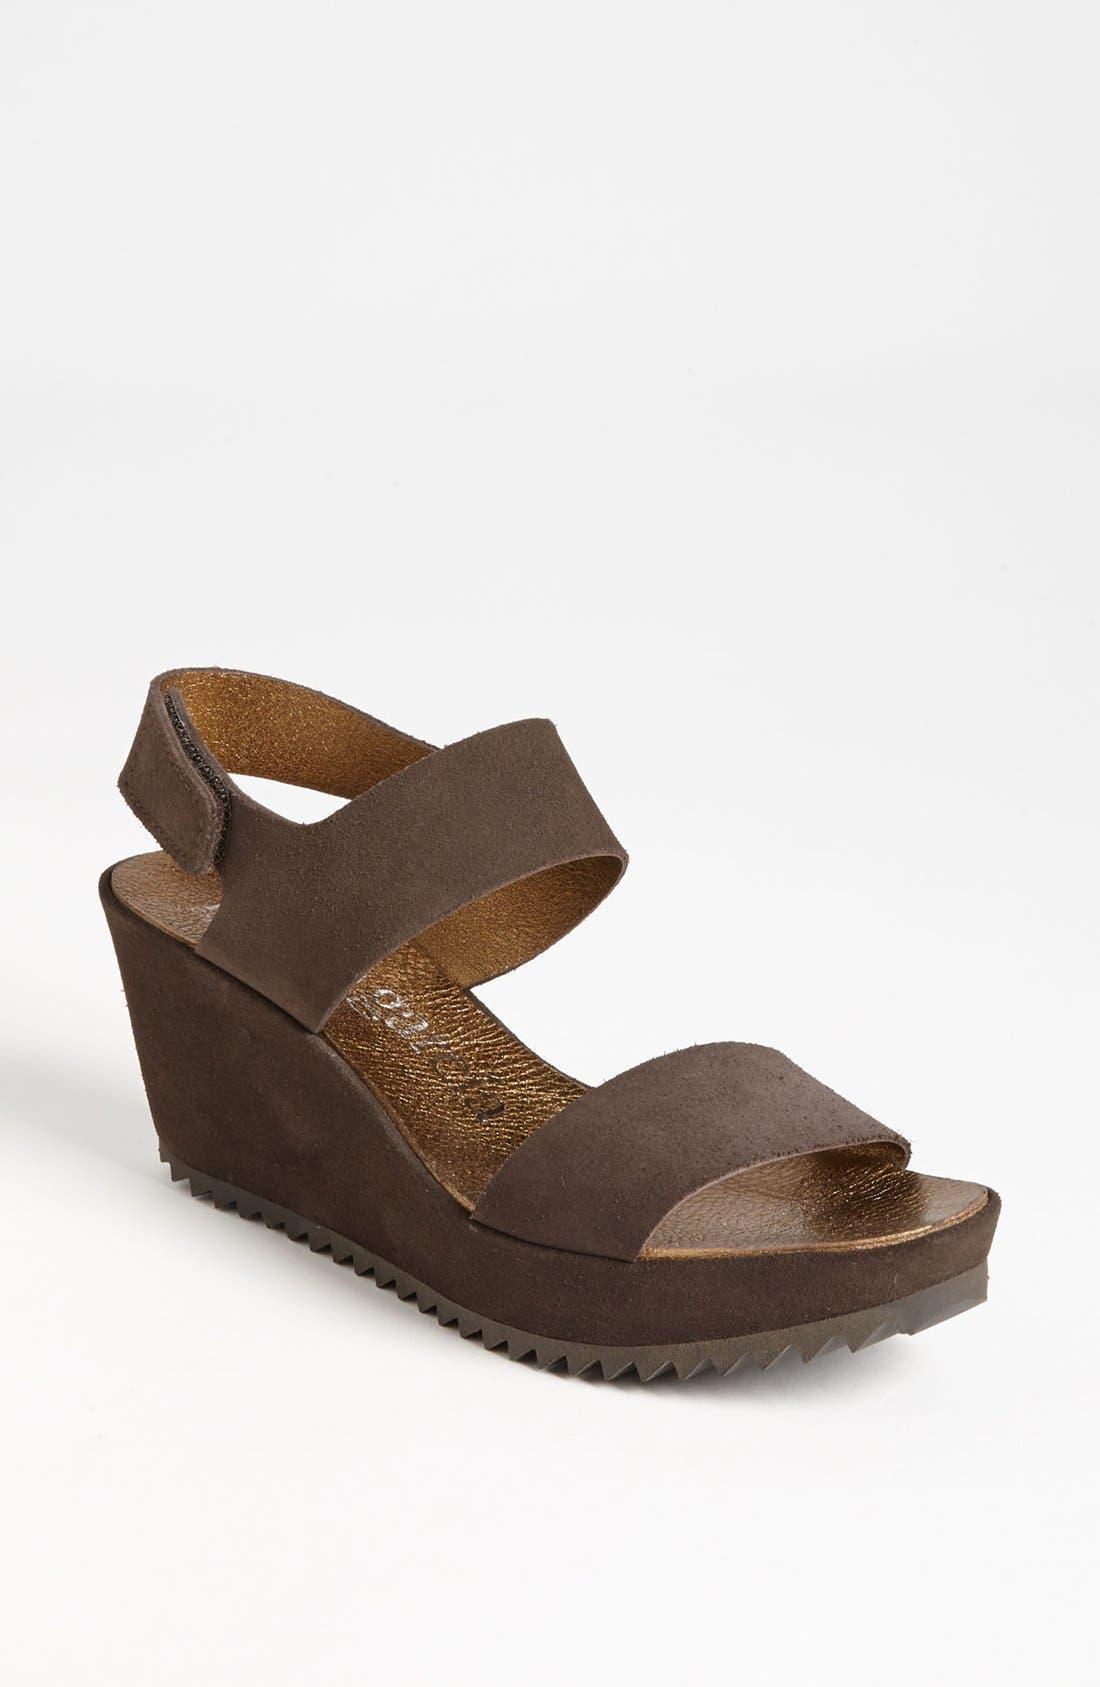 Alternate Image 1 Selected - Pedro Garcia 'Fiona' Wedge Sandal (Women)